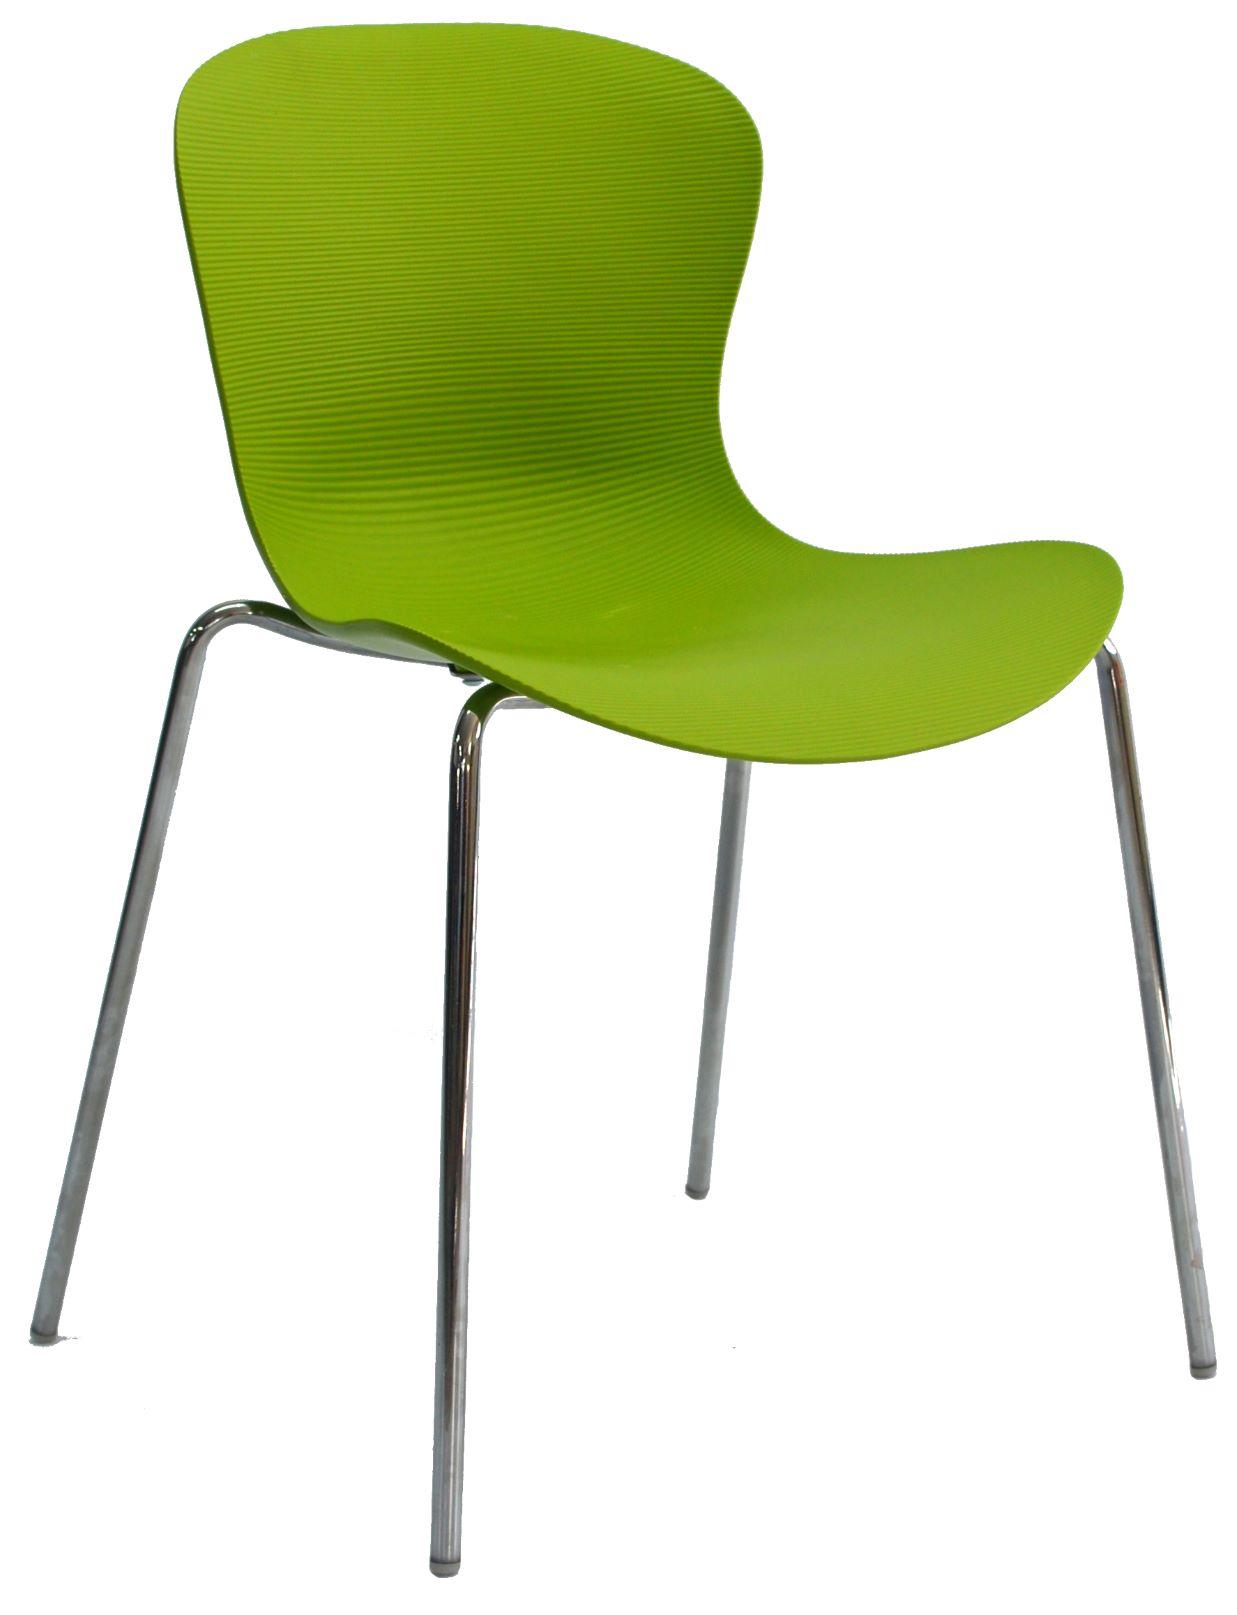 GS1401-綠